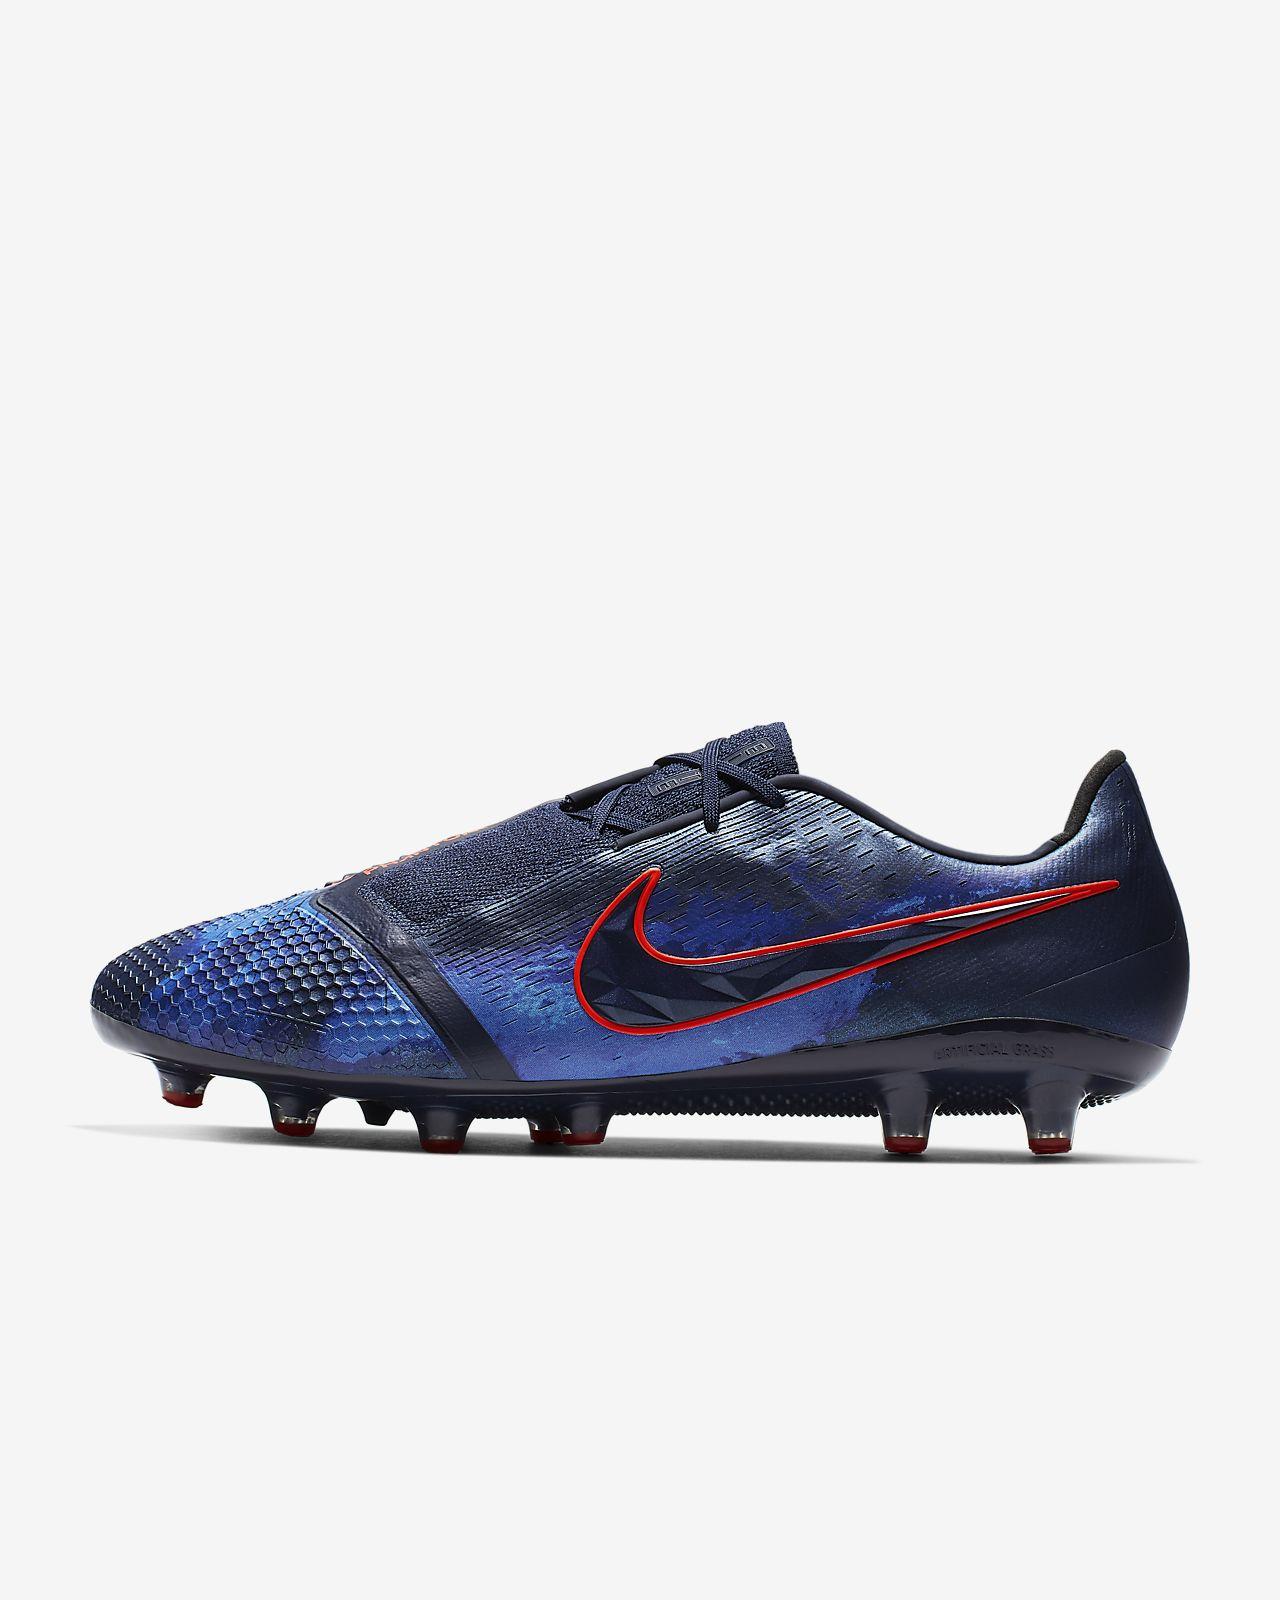 Football De Nike Crampons Pour Chaussure Terrain Synthétique À fgyIY7vmb6